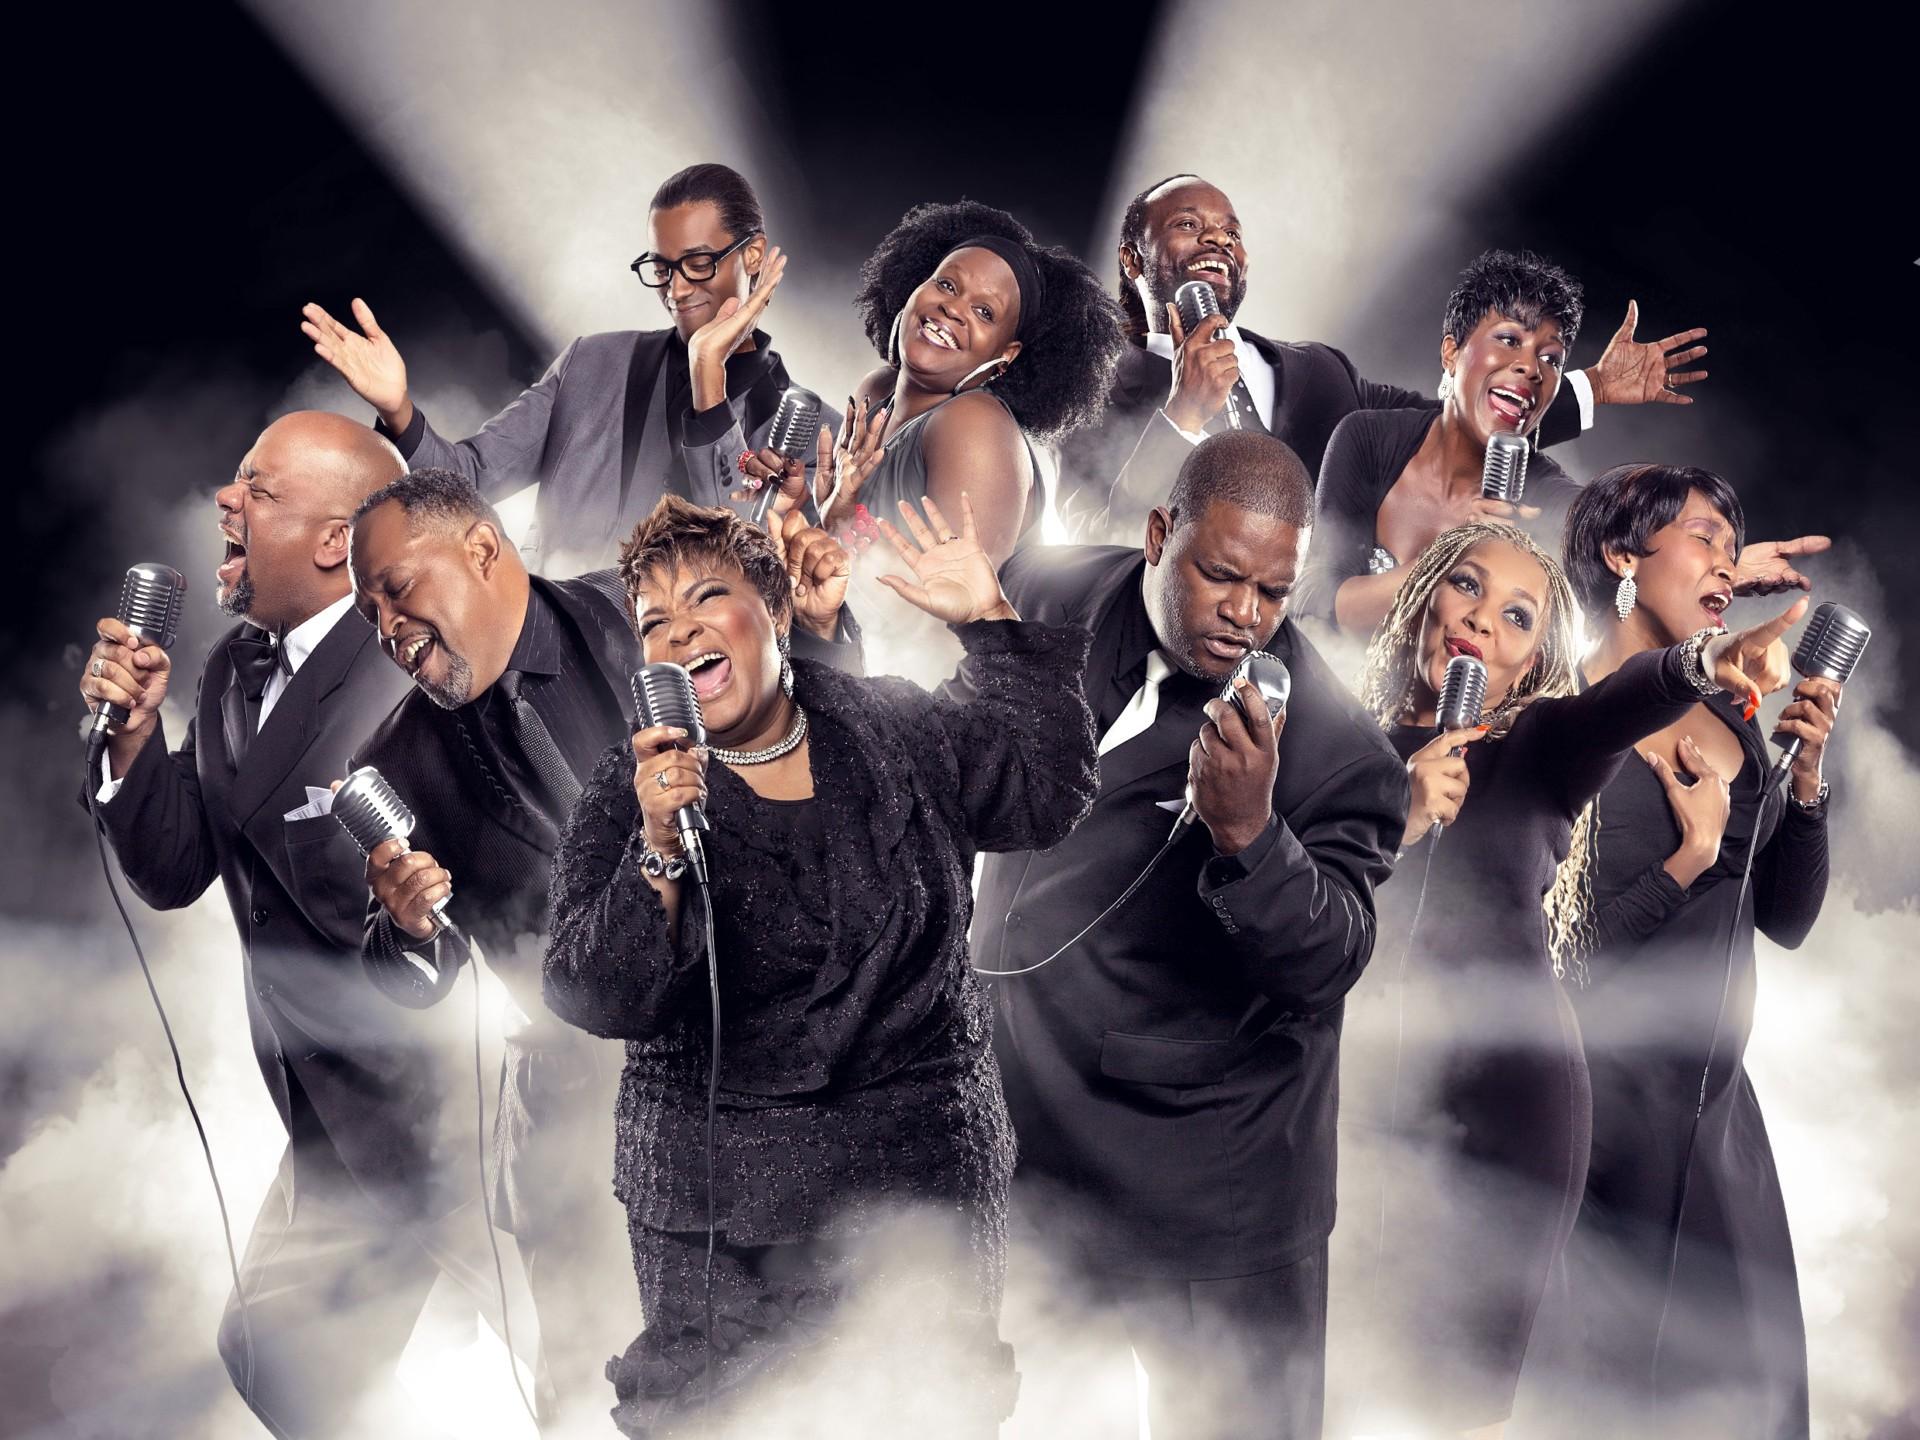 06 Sweet Soul Gospel Revue - OXMOX verlost Tickets: Die schönsten Geschenke